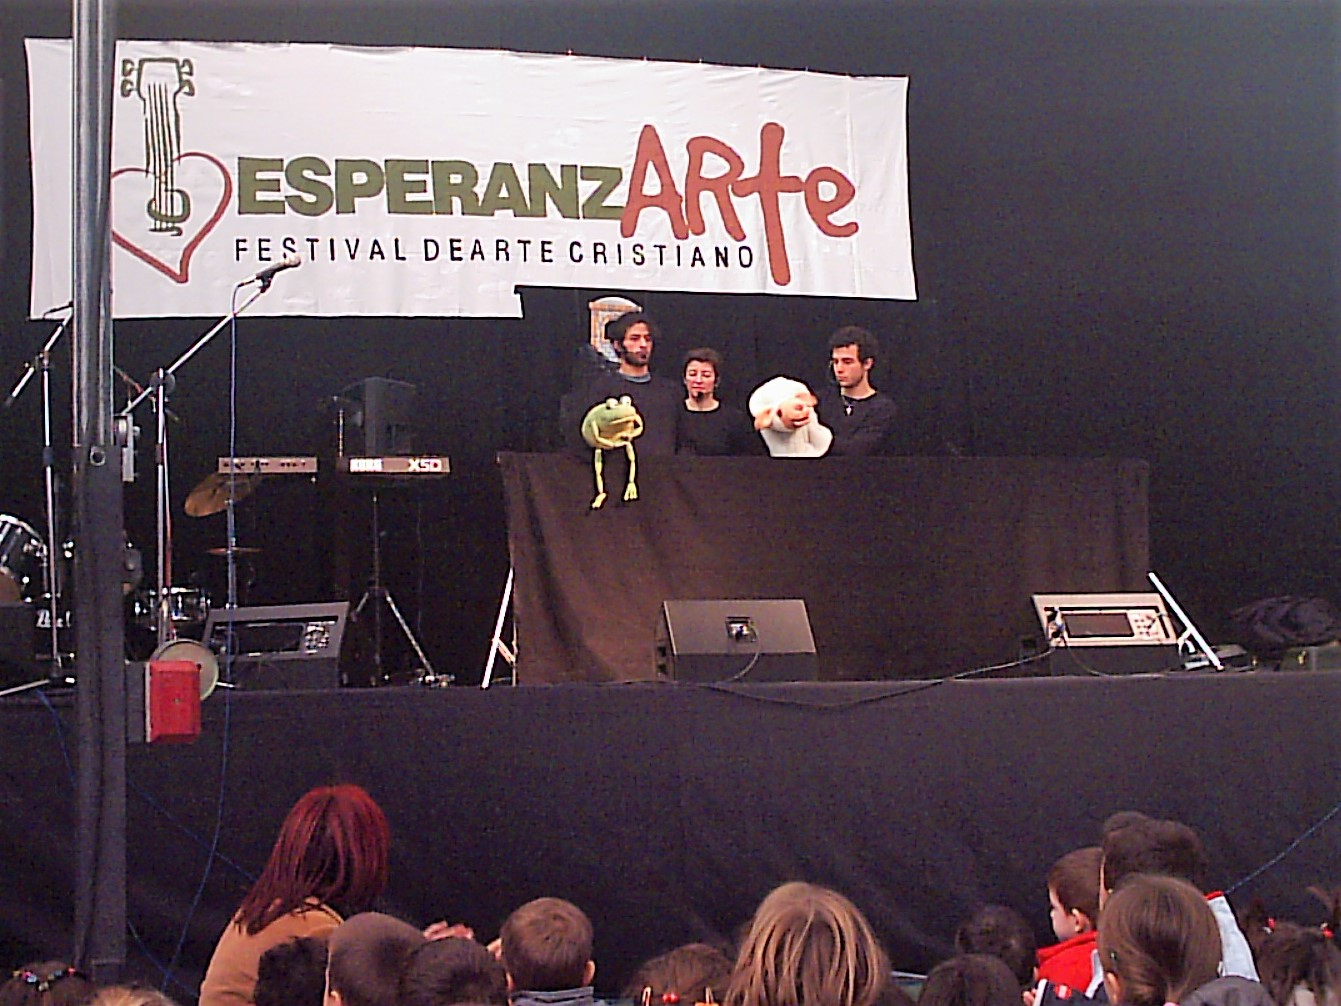 Valiván - EsperanzARTE 2004